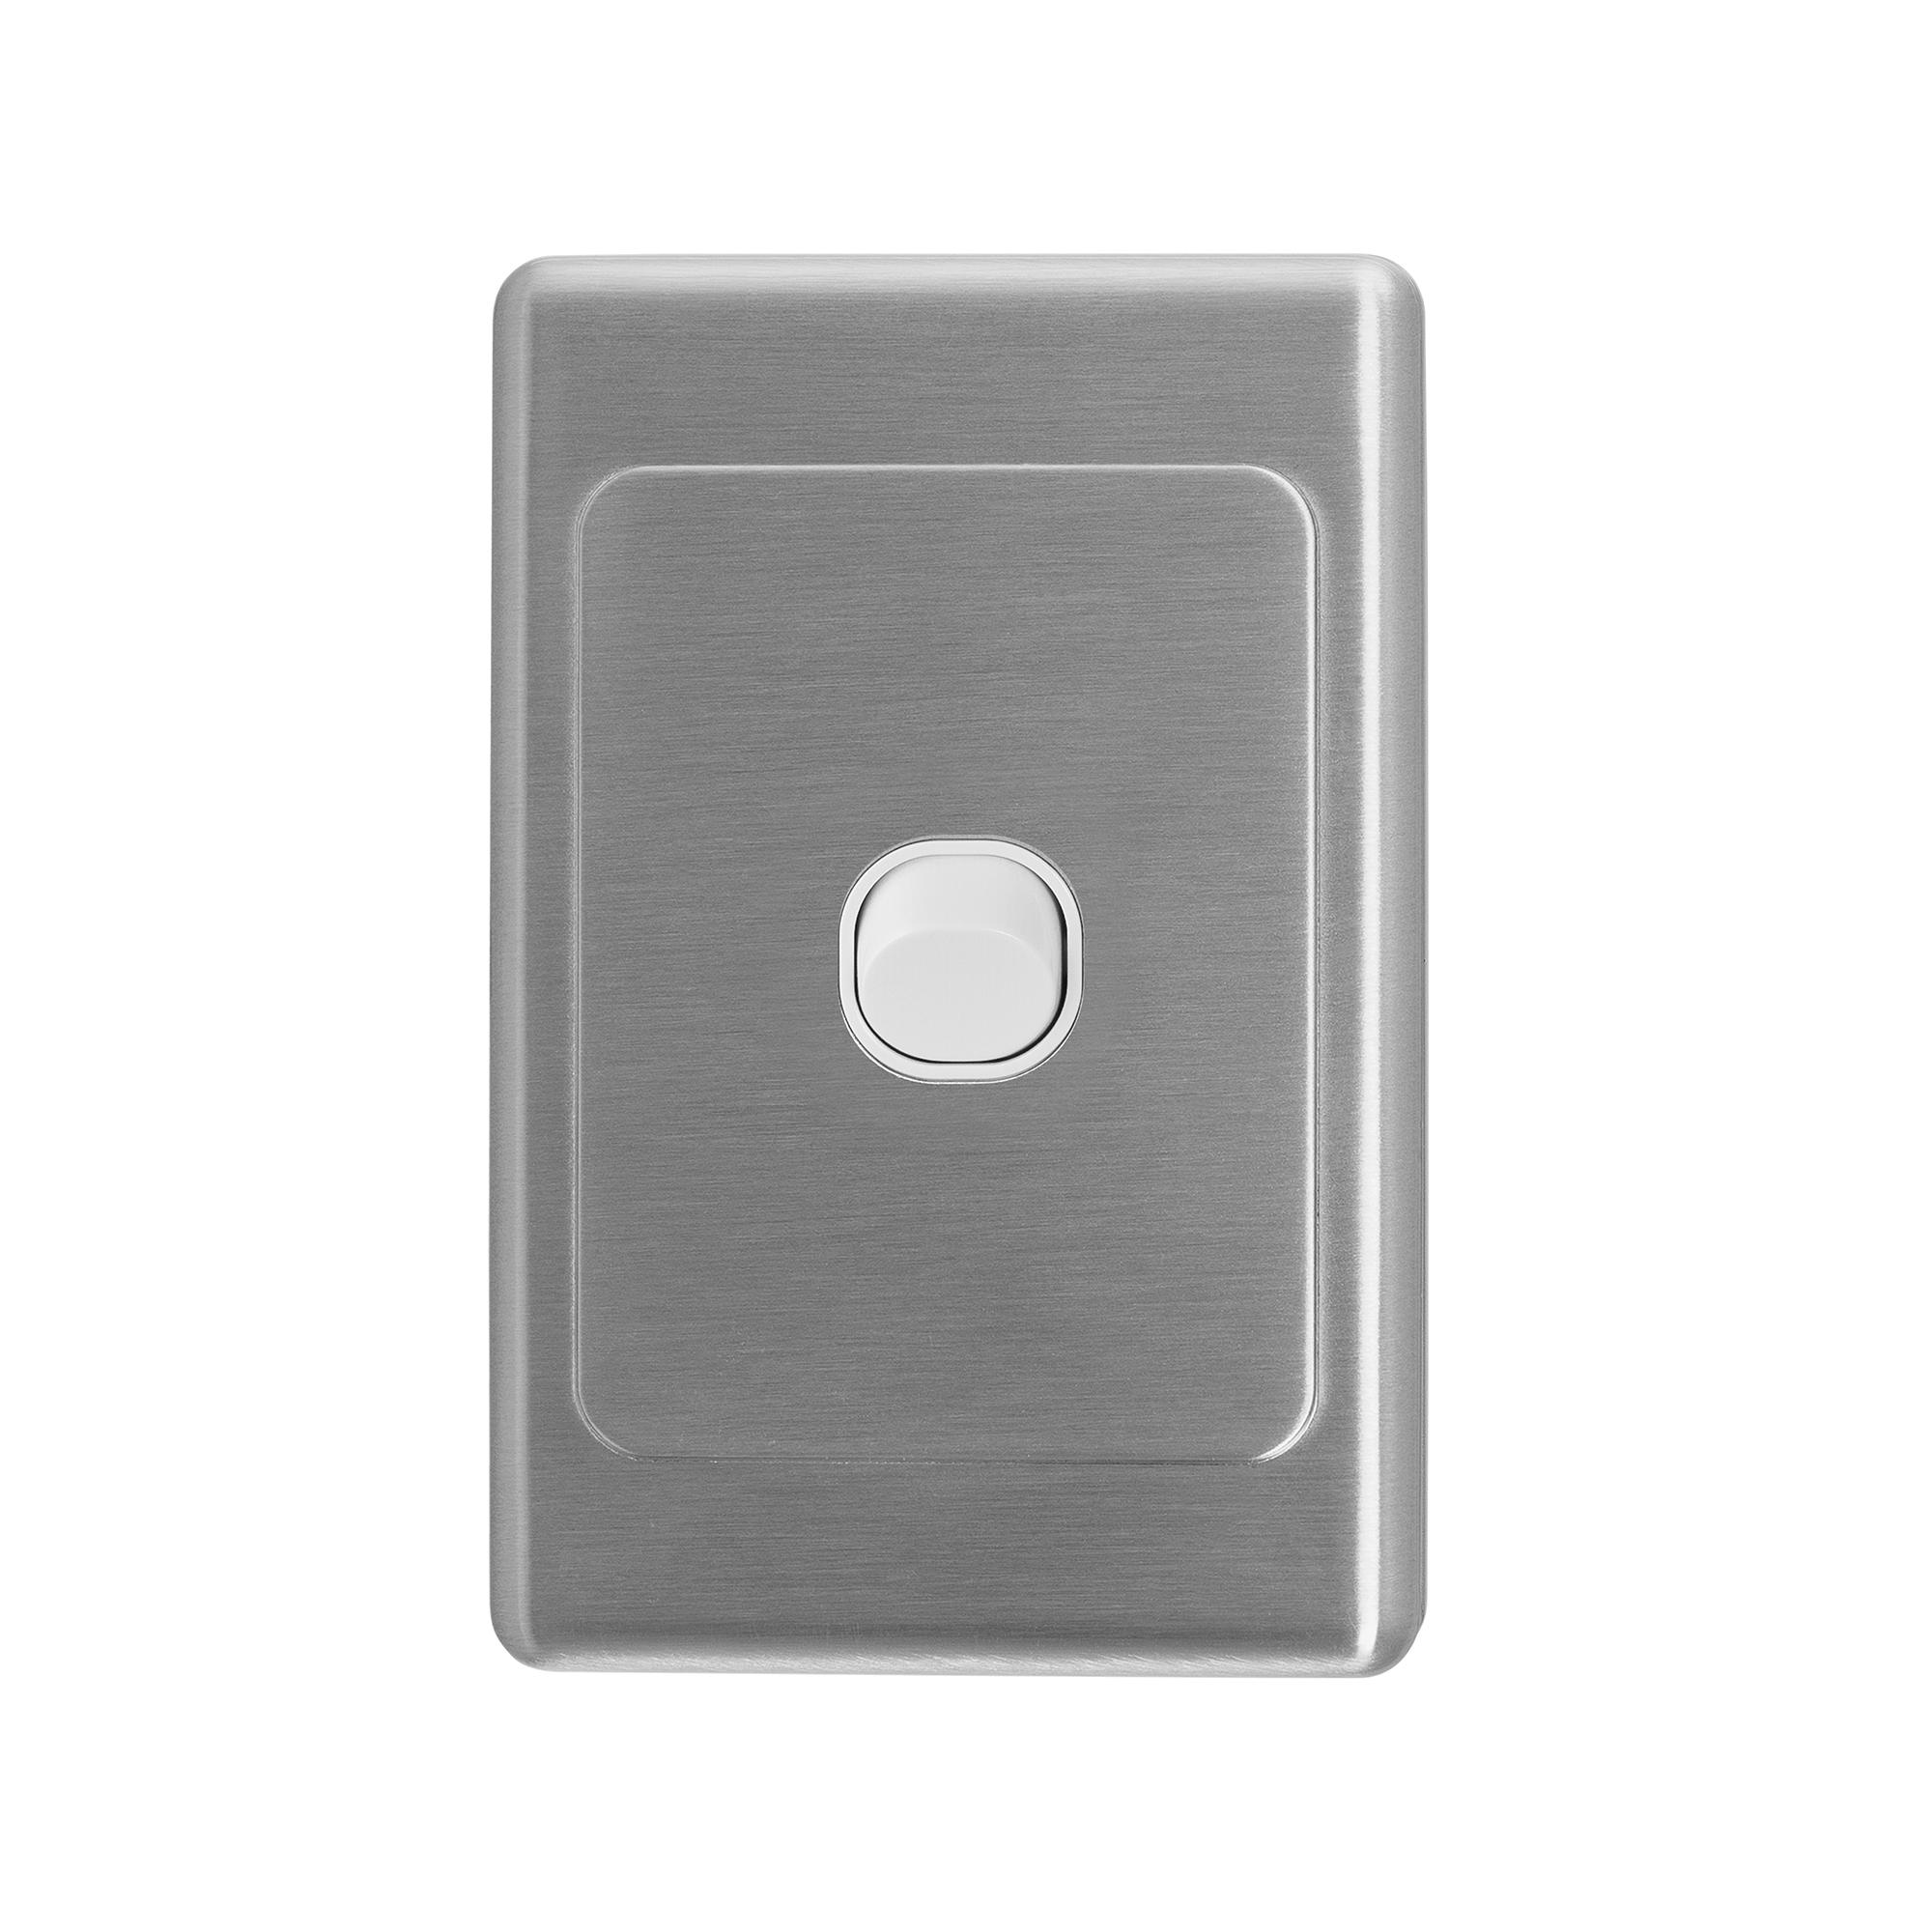 S/steel s-line vertical switch